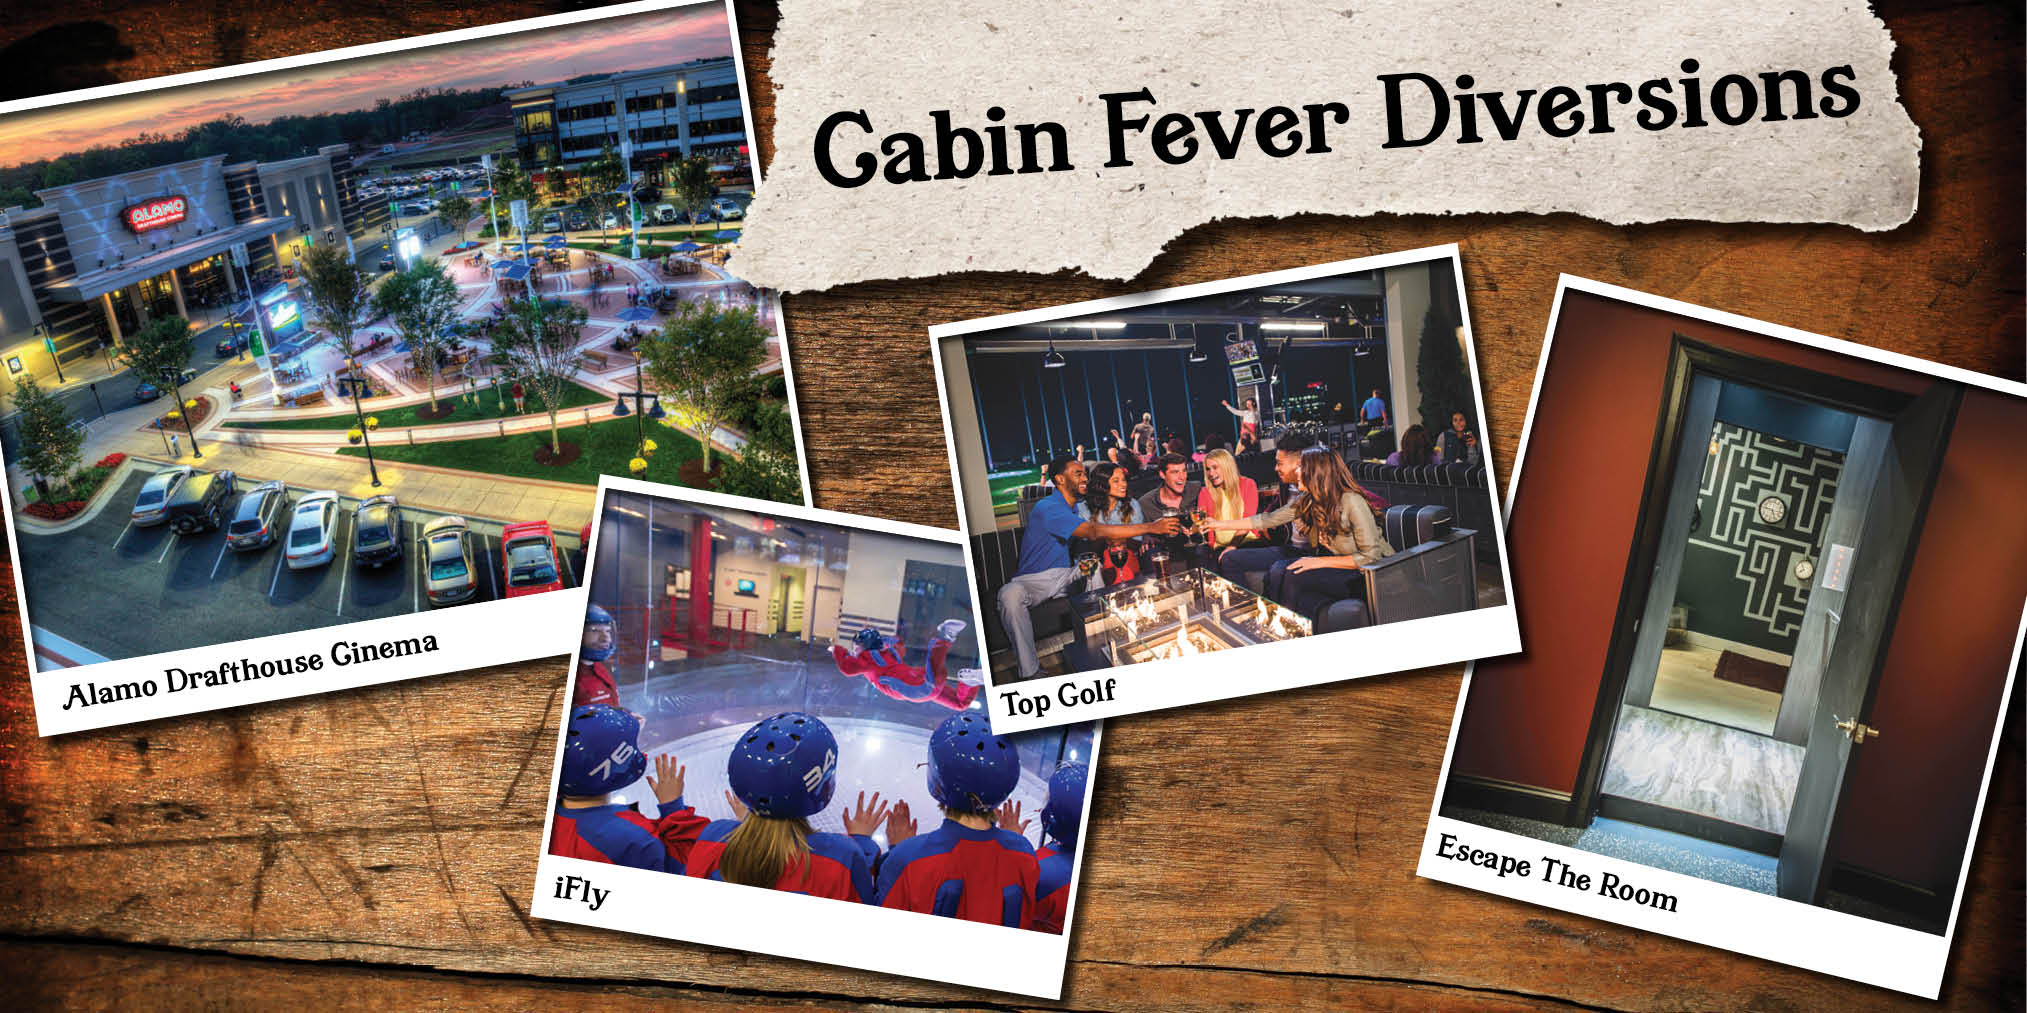 Cabin Fever Diversions